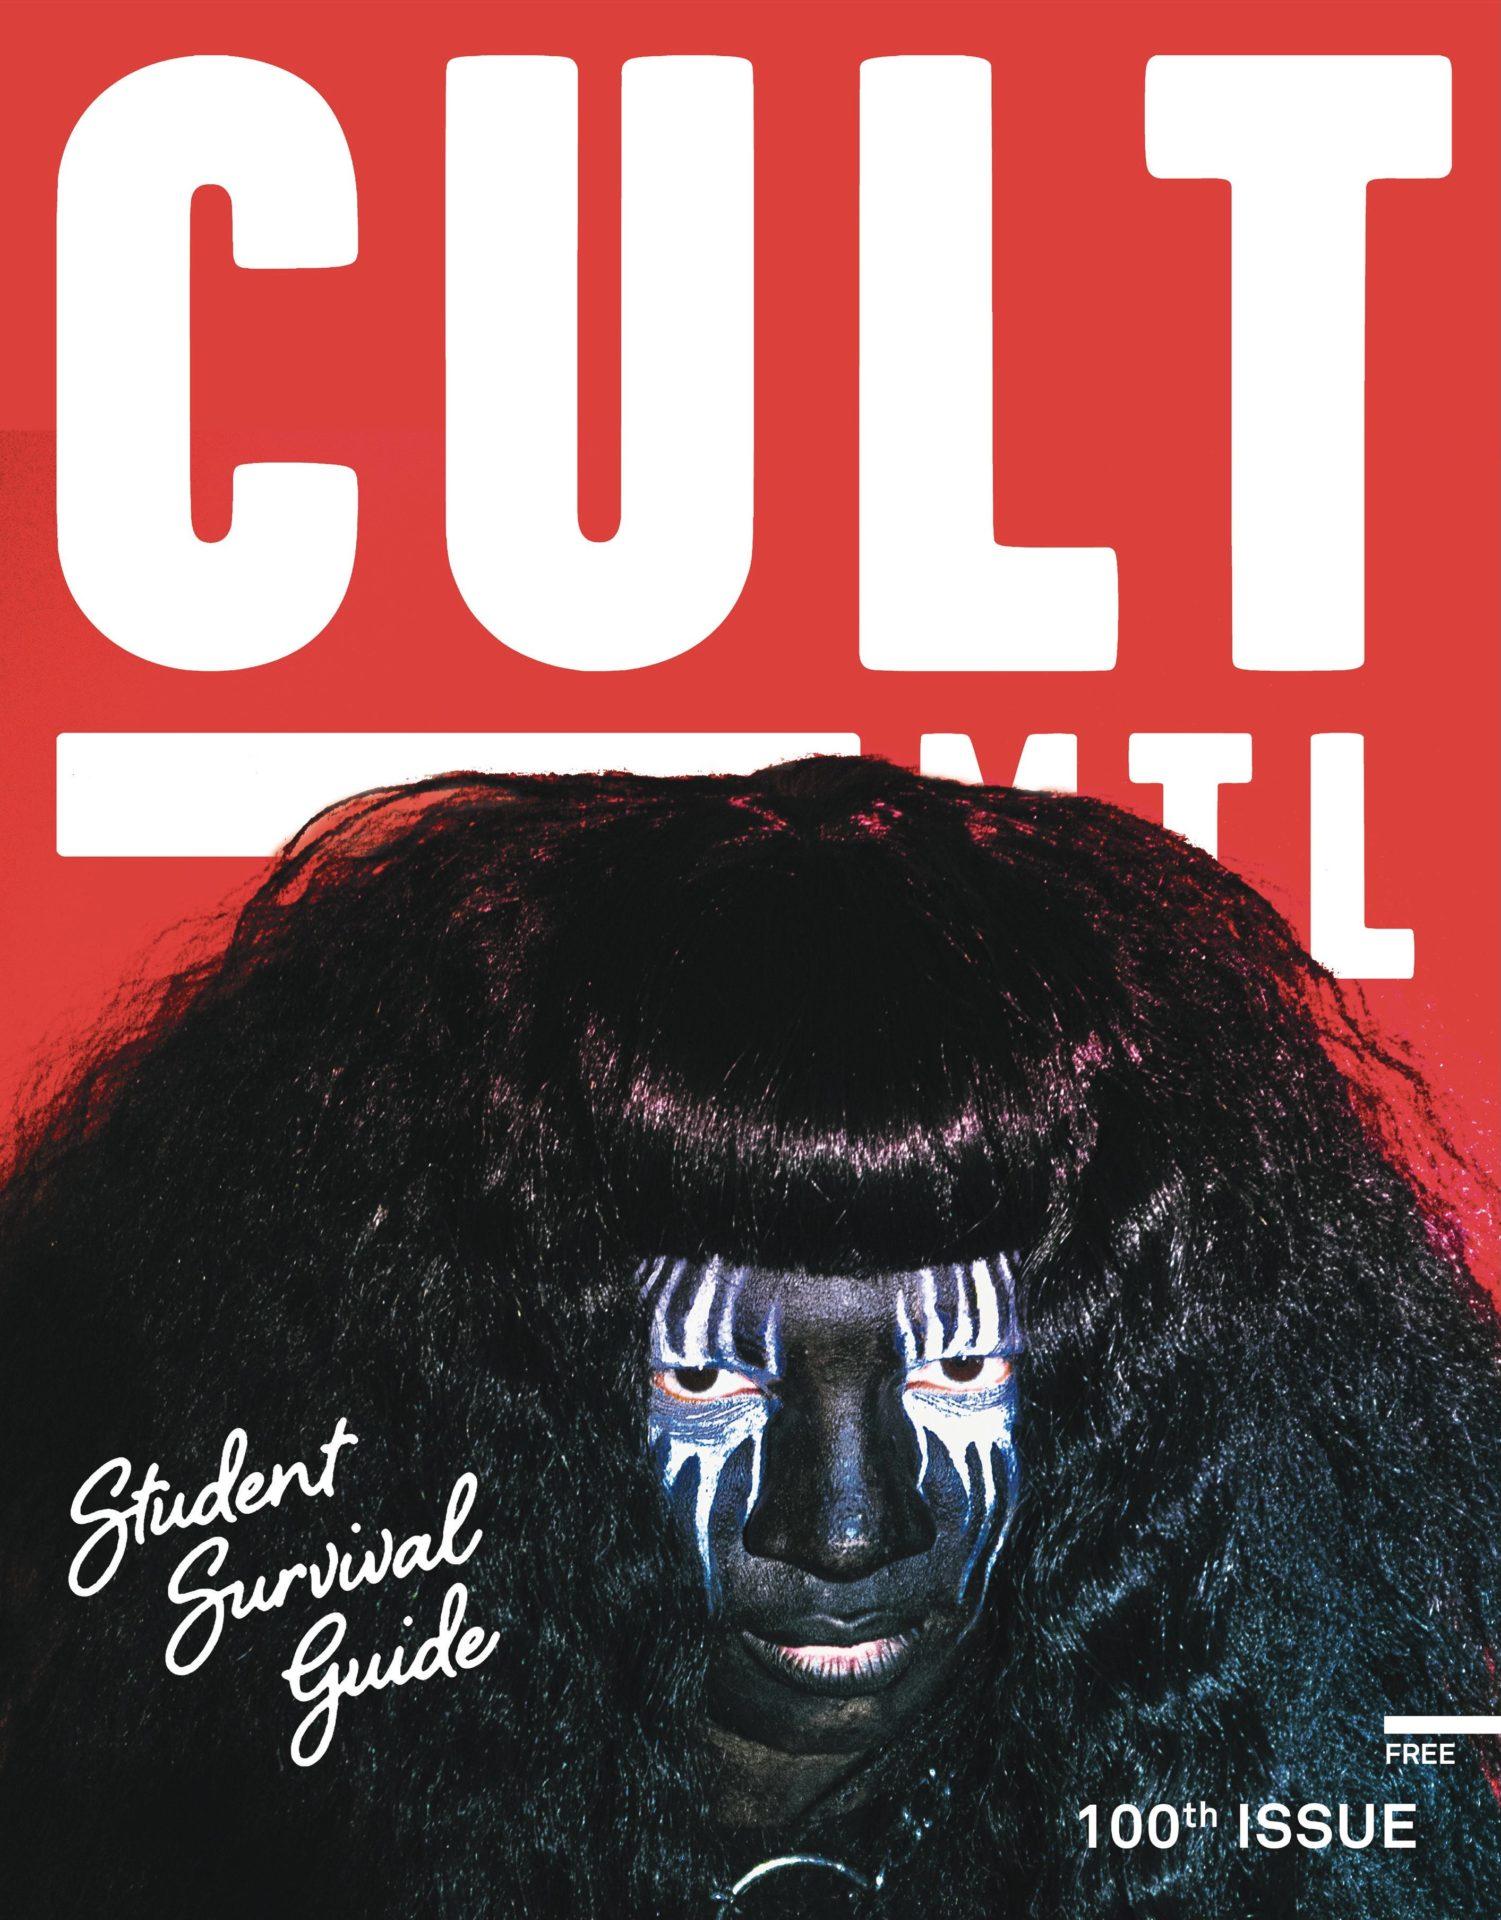 cult mtl magazine september 2021 cover backxwash student survival guide